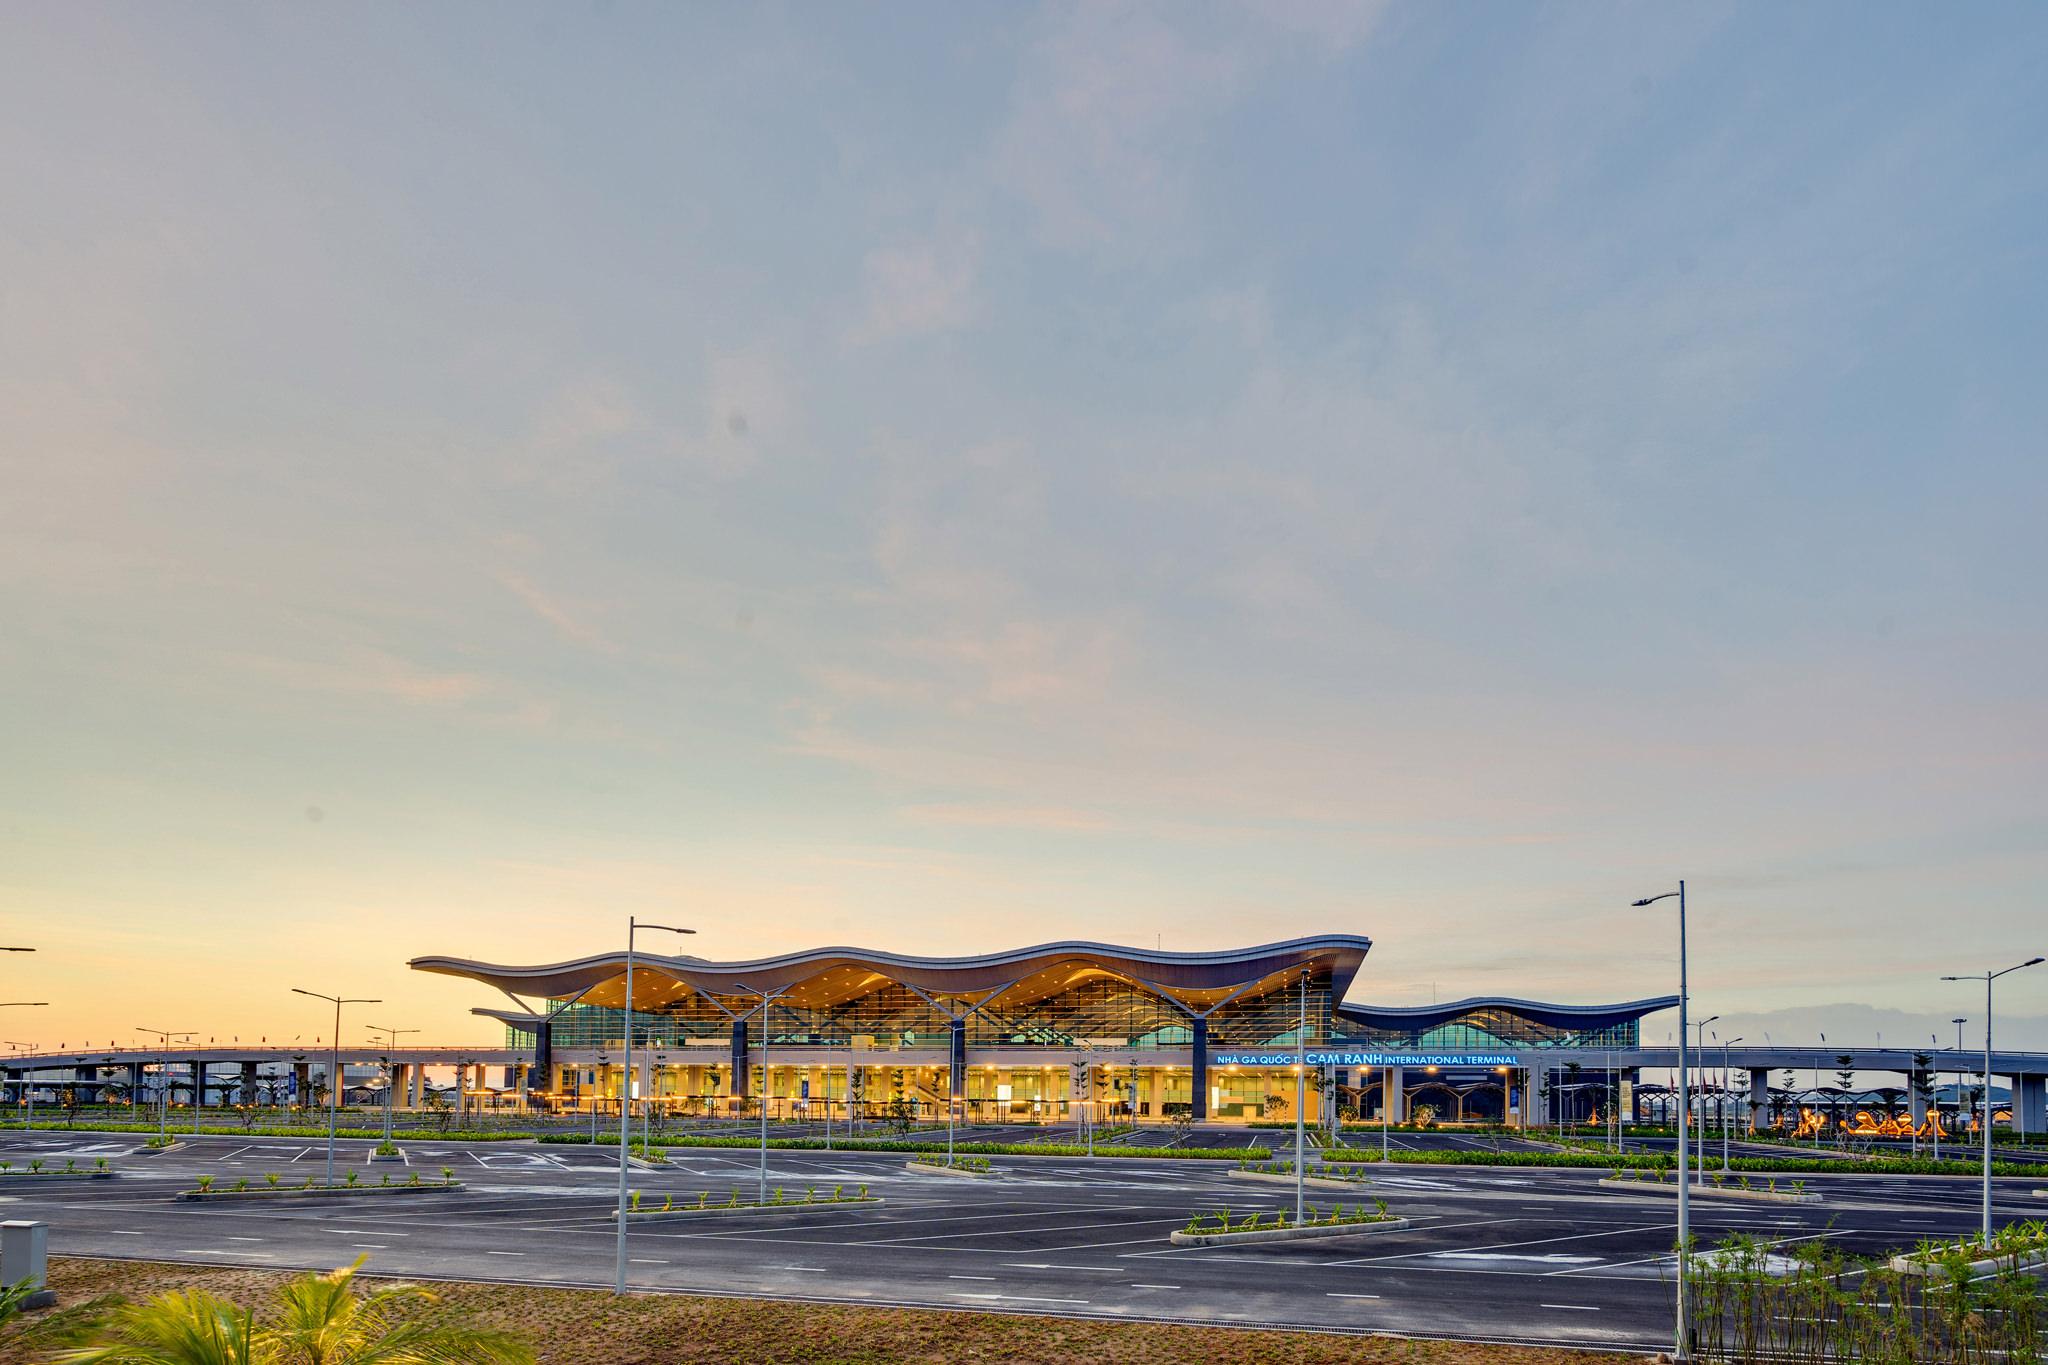 20180626 - Cam Ranh Airport - Architecture - 0005.jpg